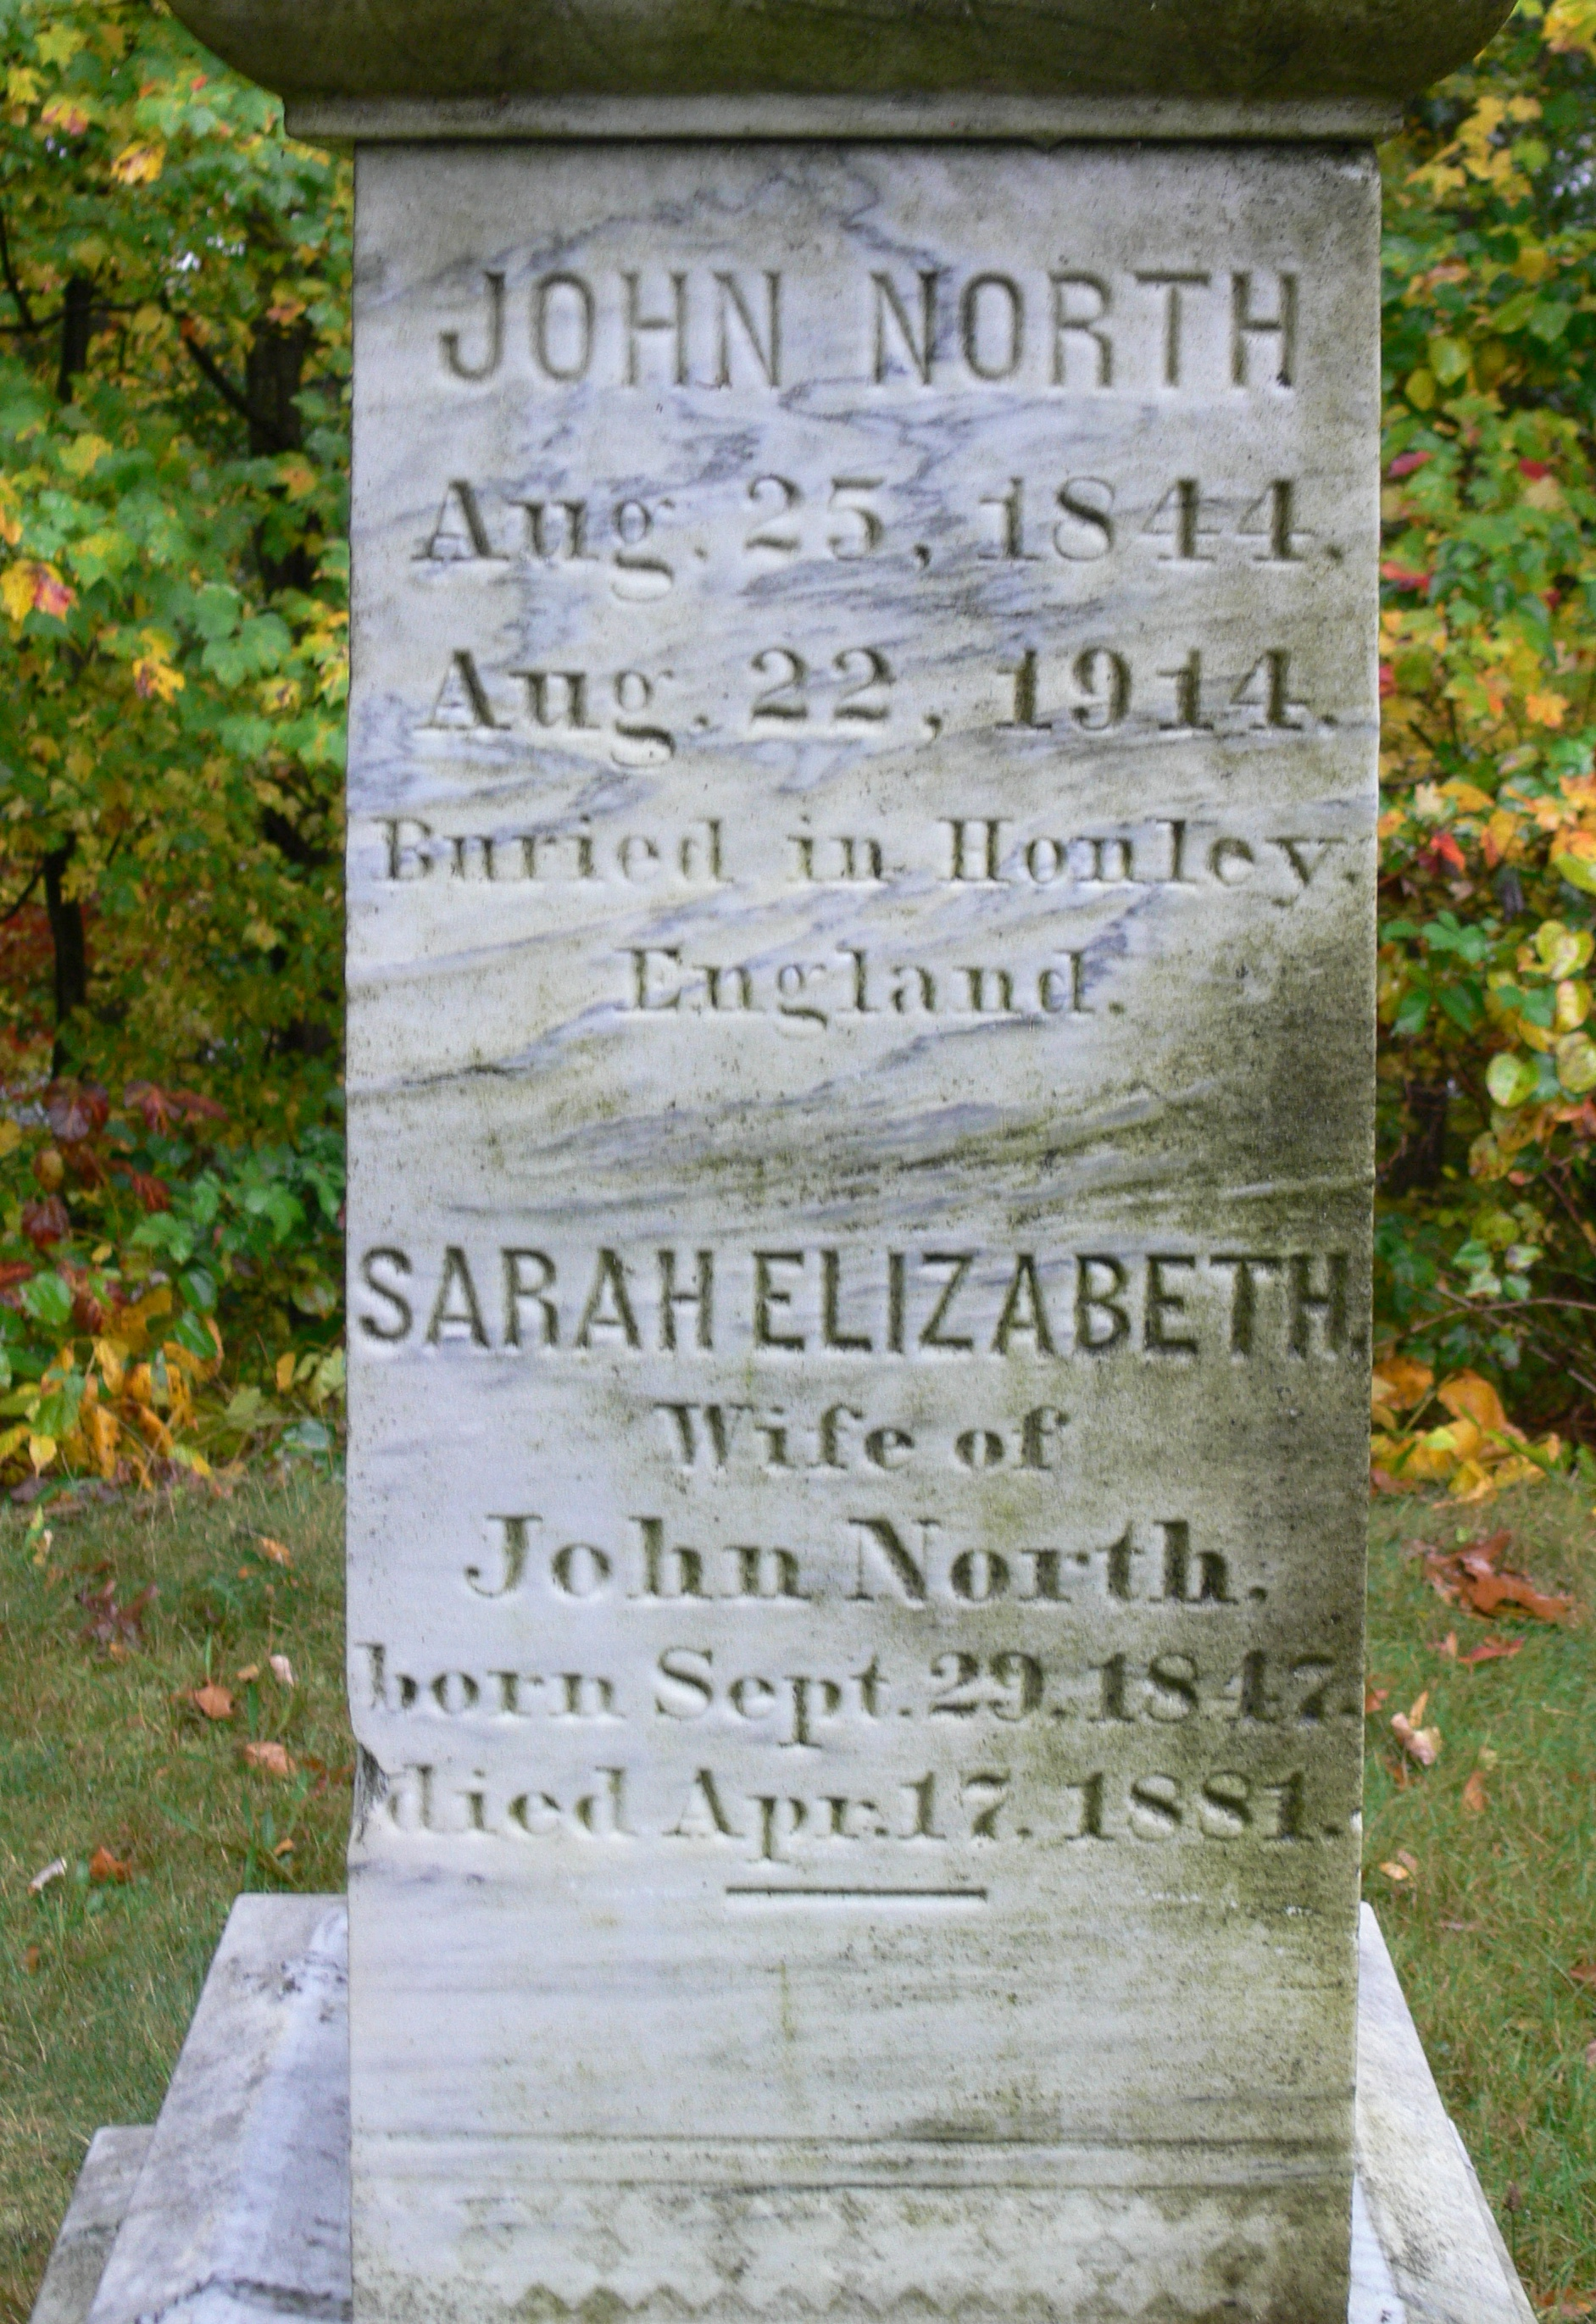 Sarah Elizabeth North